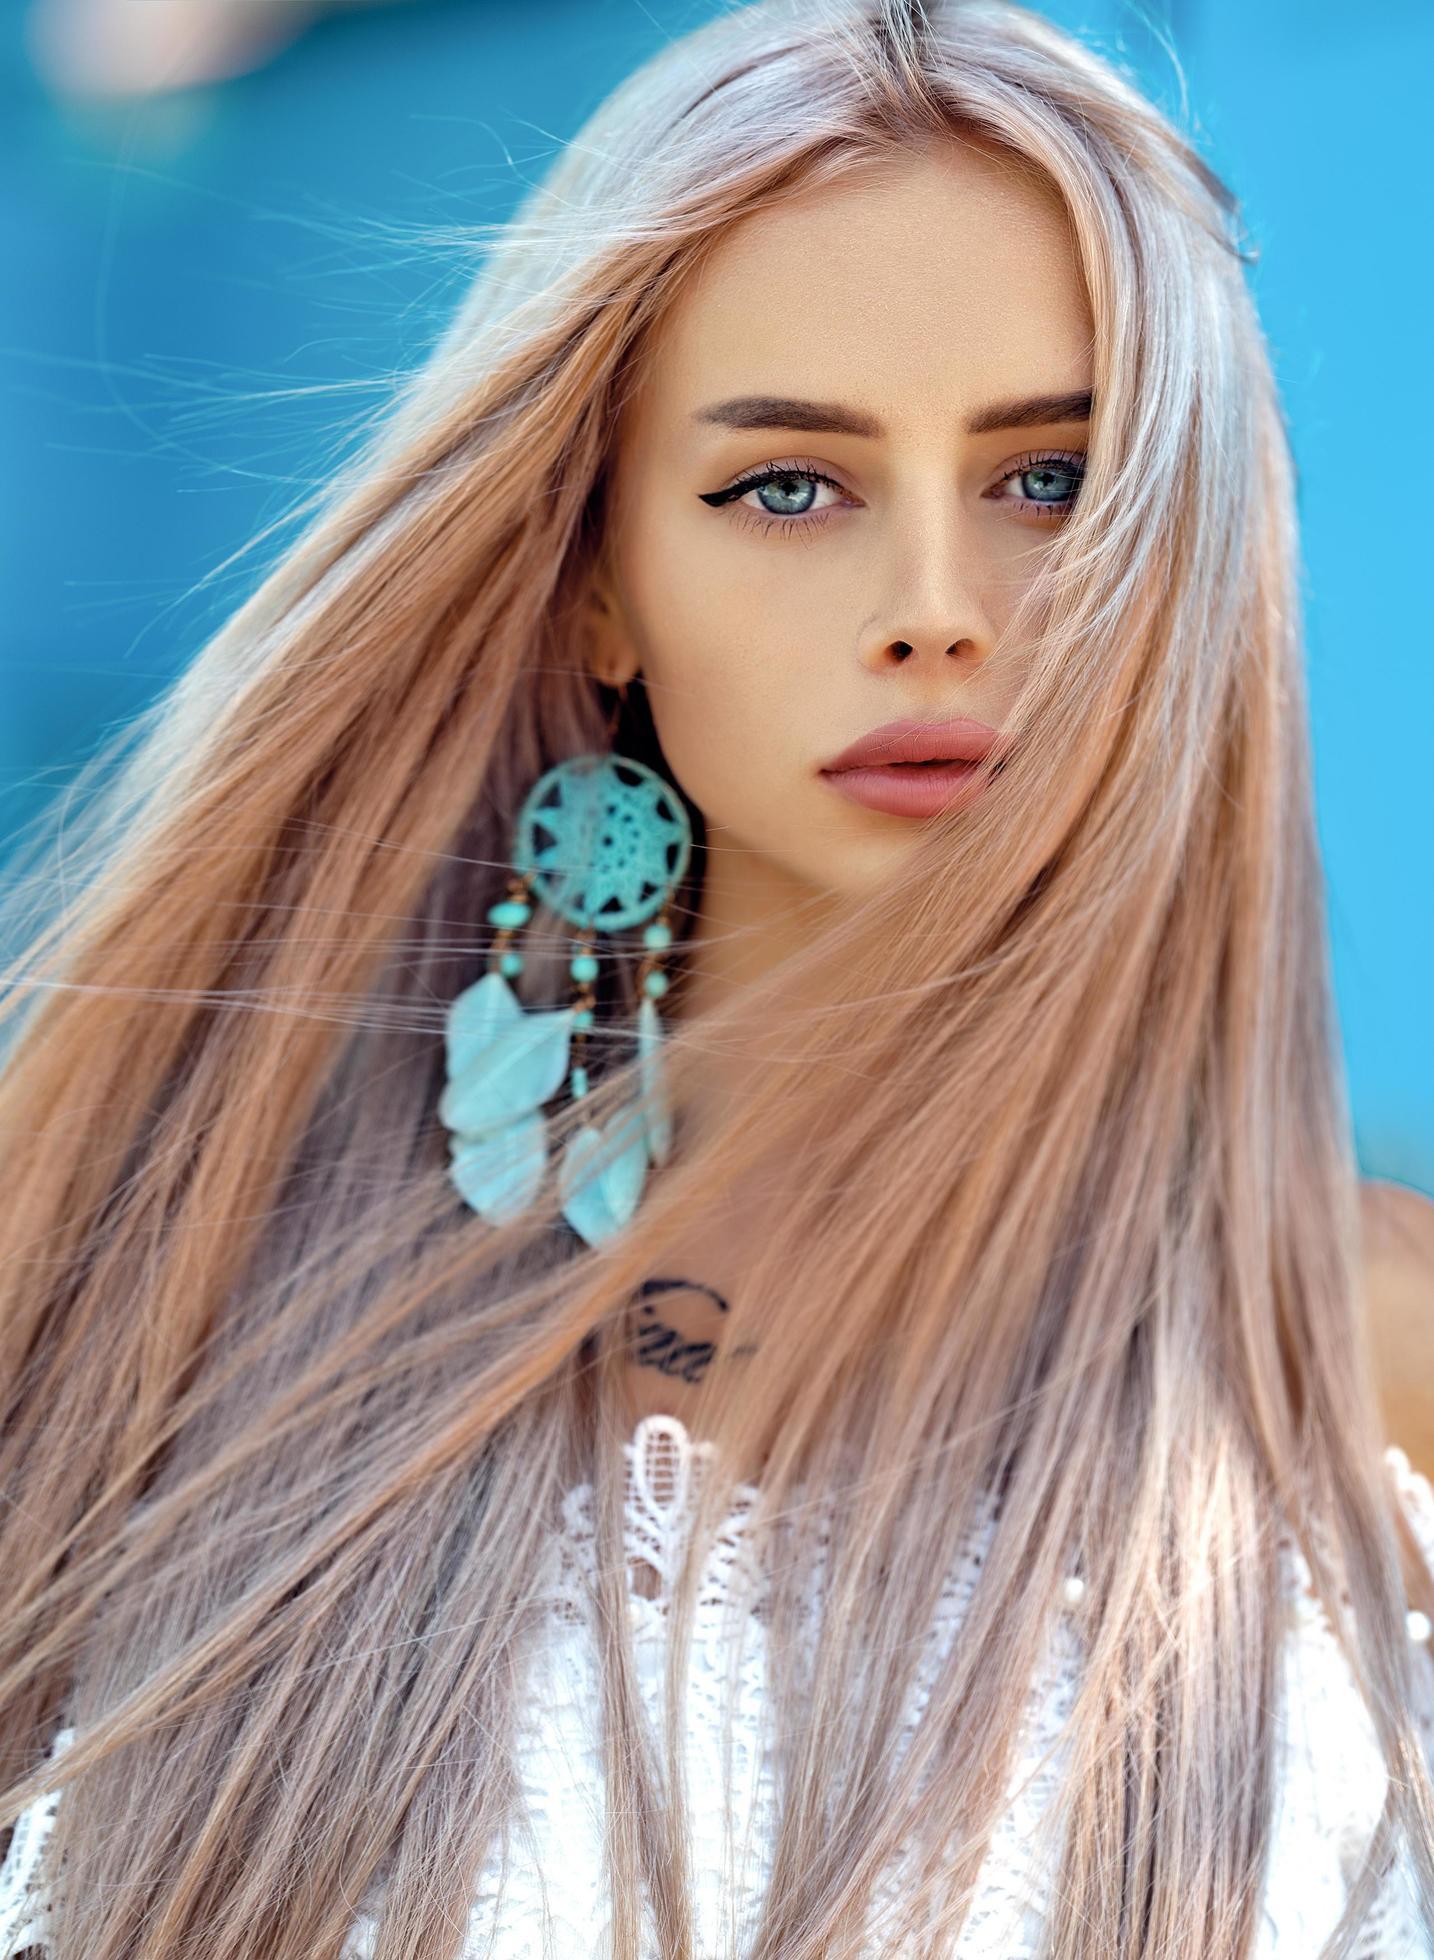 And hair turquoise blonde Paris Jackson